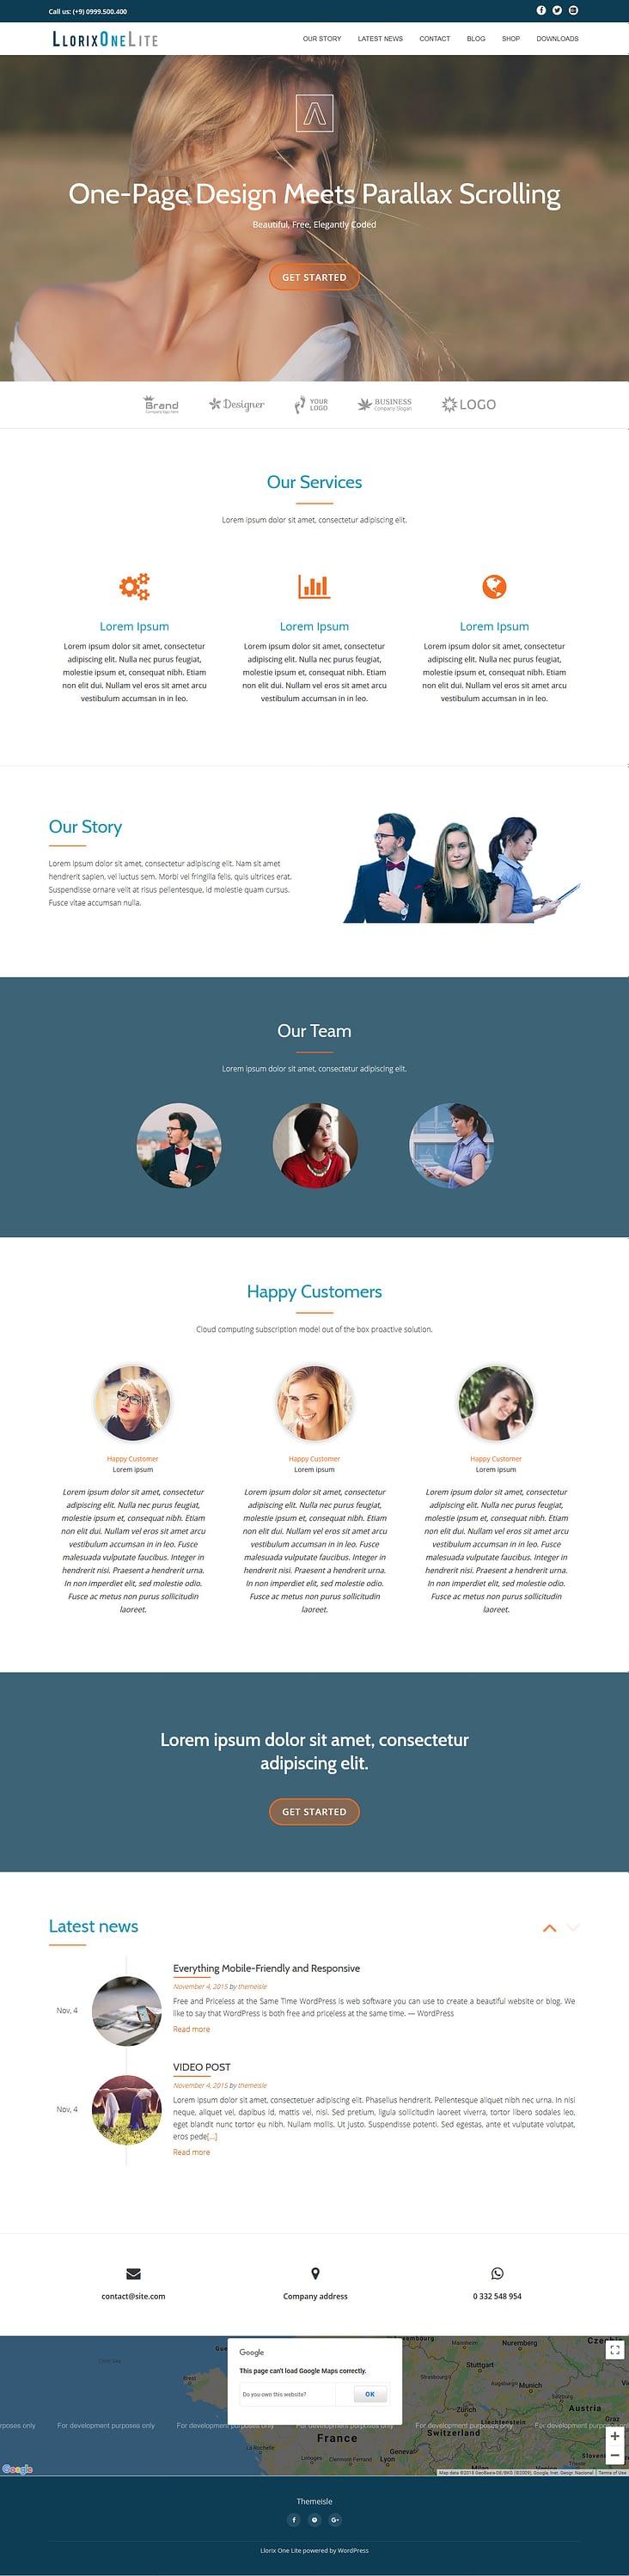 llorix one lite best free fullscreen wordpress theme - 10+ Best Free FullScreen WordPress Themes